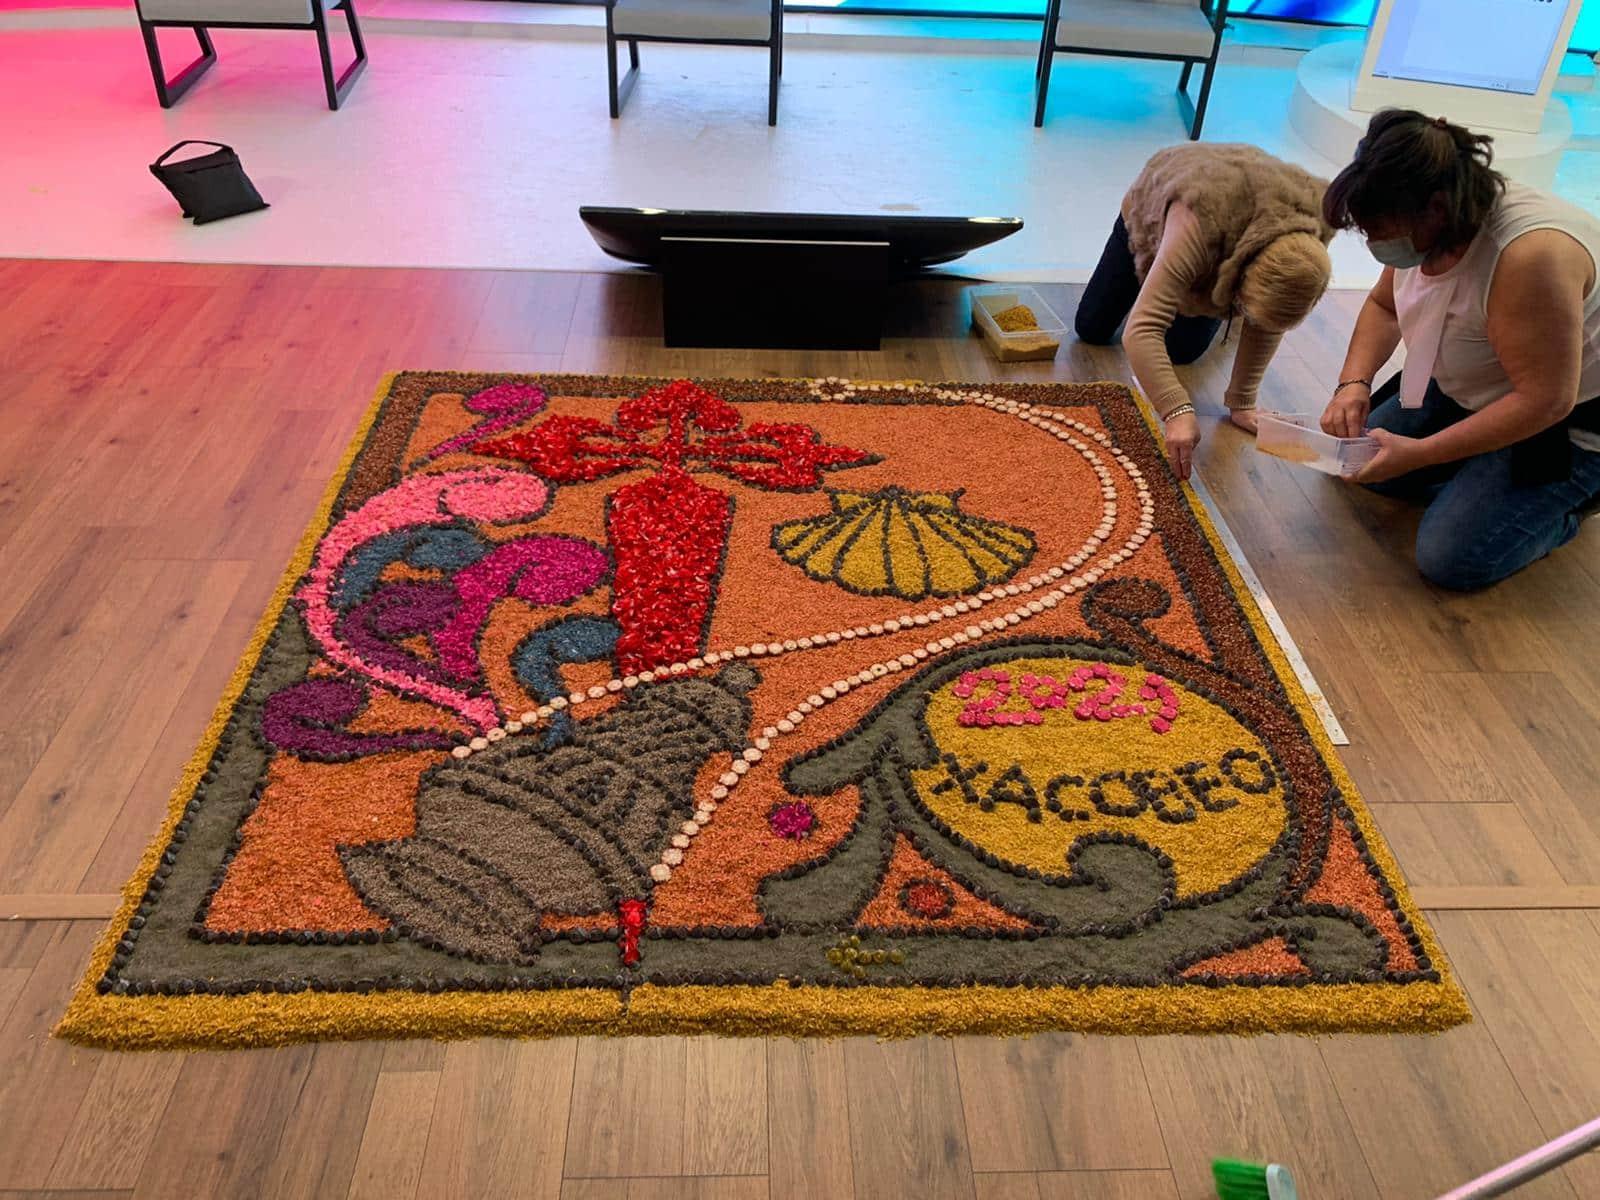 Teguise se une a 250 ciudades de 30 países que realizarán la alfombra mundial del Xacobeo 2021